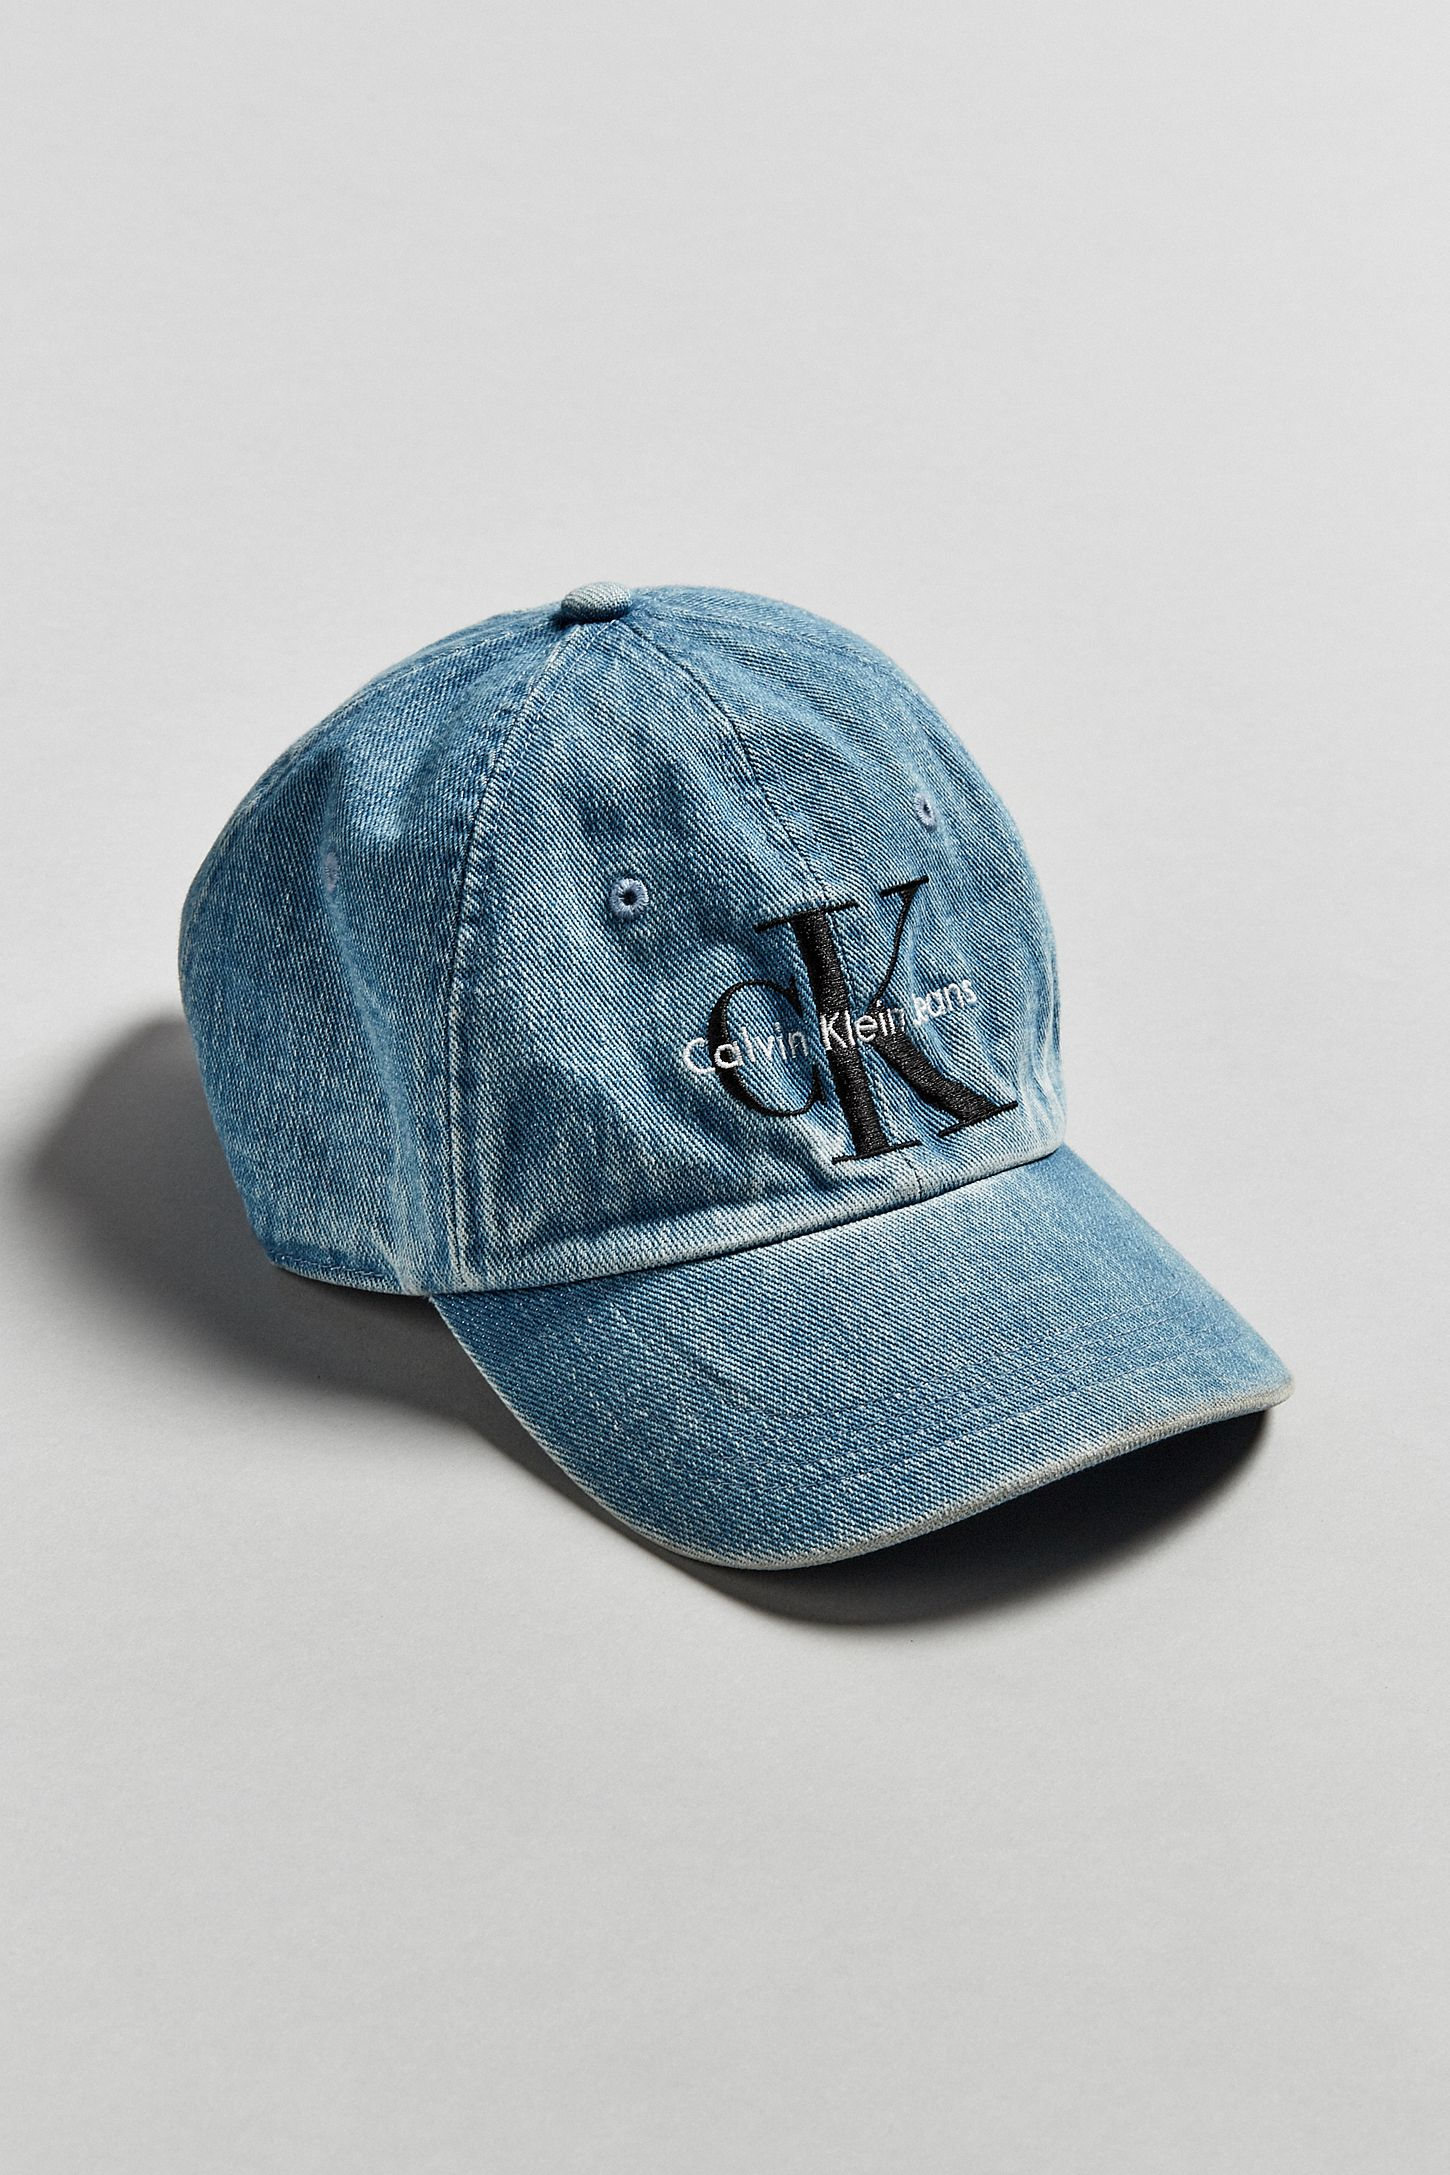 Calvin Klein Baseball Hat  5180be460